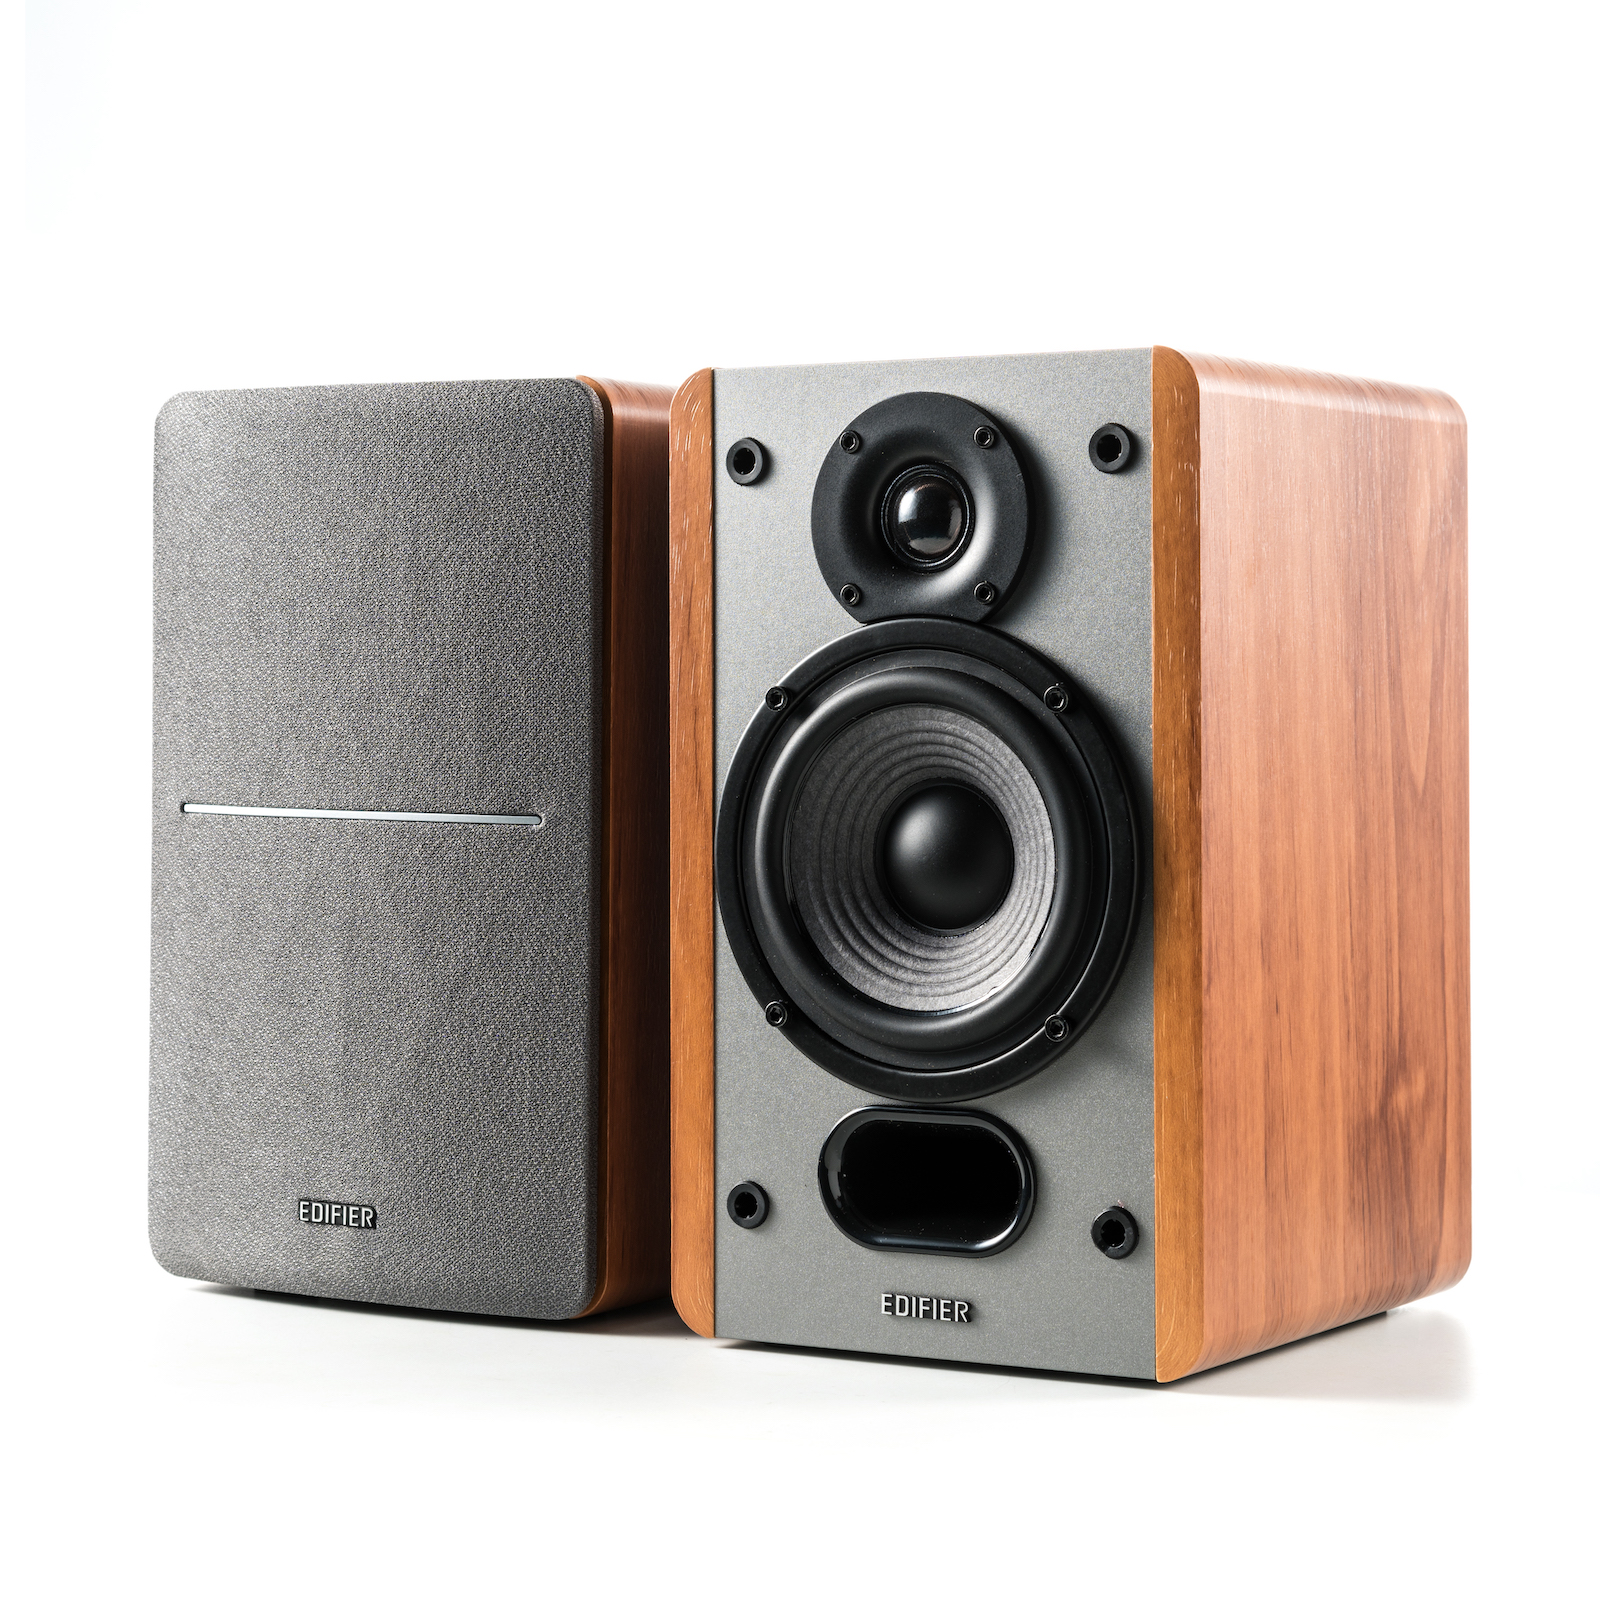 Edifier P12 Passive Bookshelf Speakers - Pair - $71.99 - $28 off or 28%